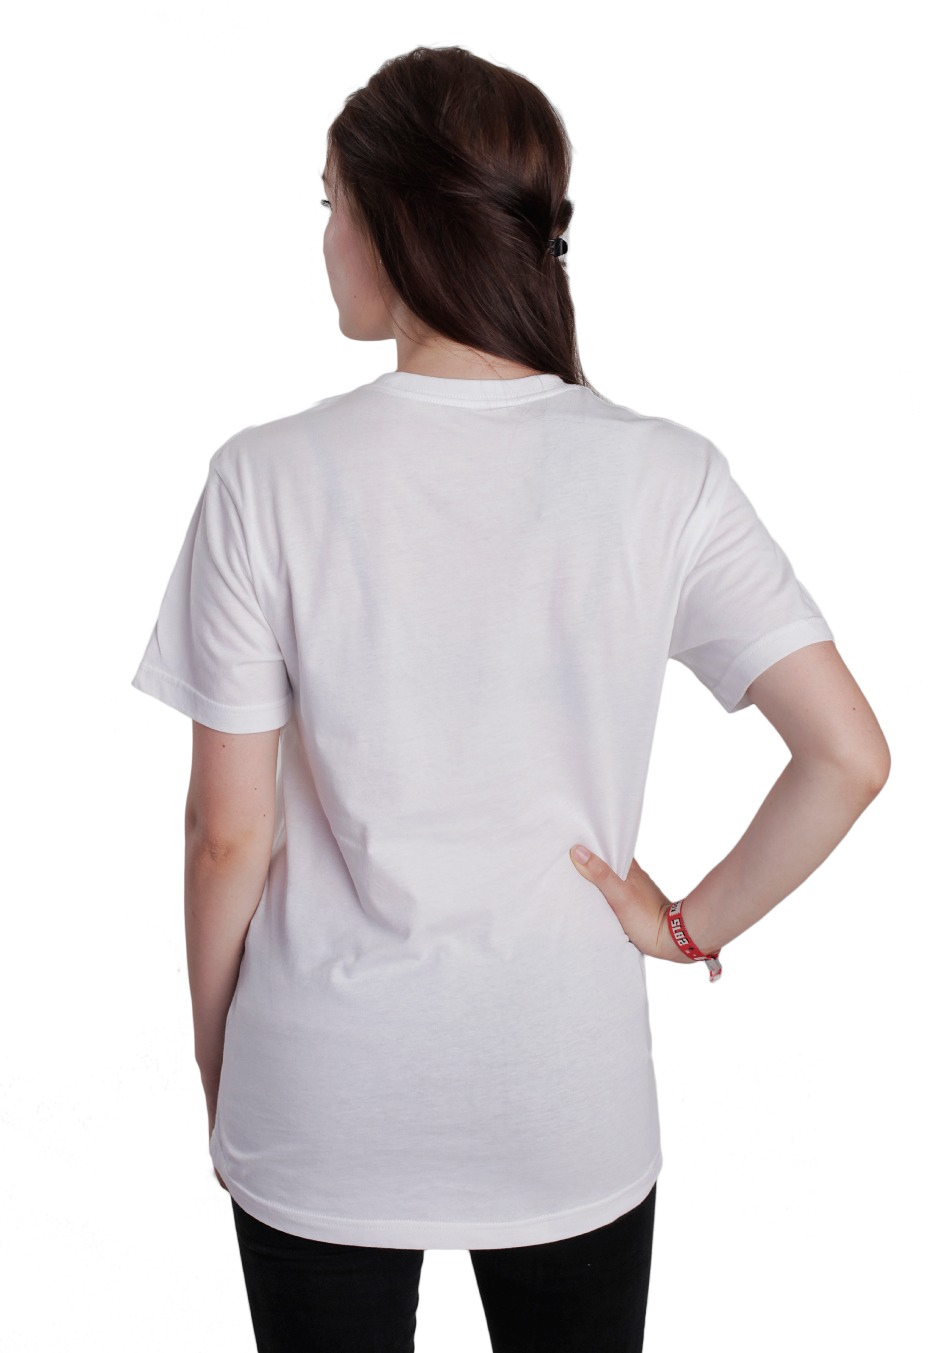 Drop Dead - Hunted White - T-Shirt - Impericon.com AU 60b161eb2